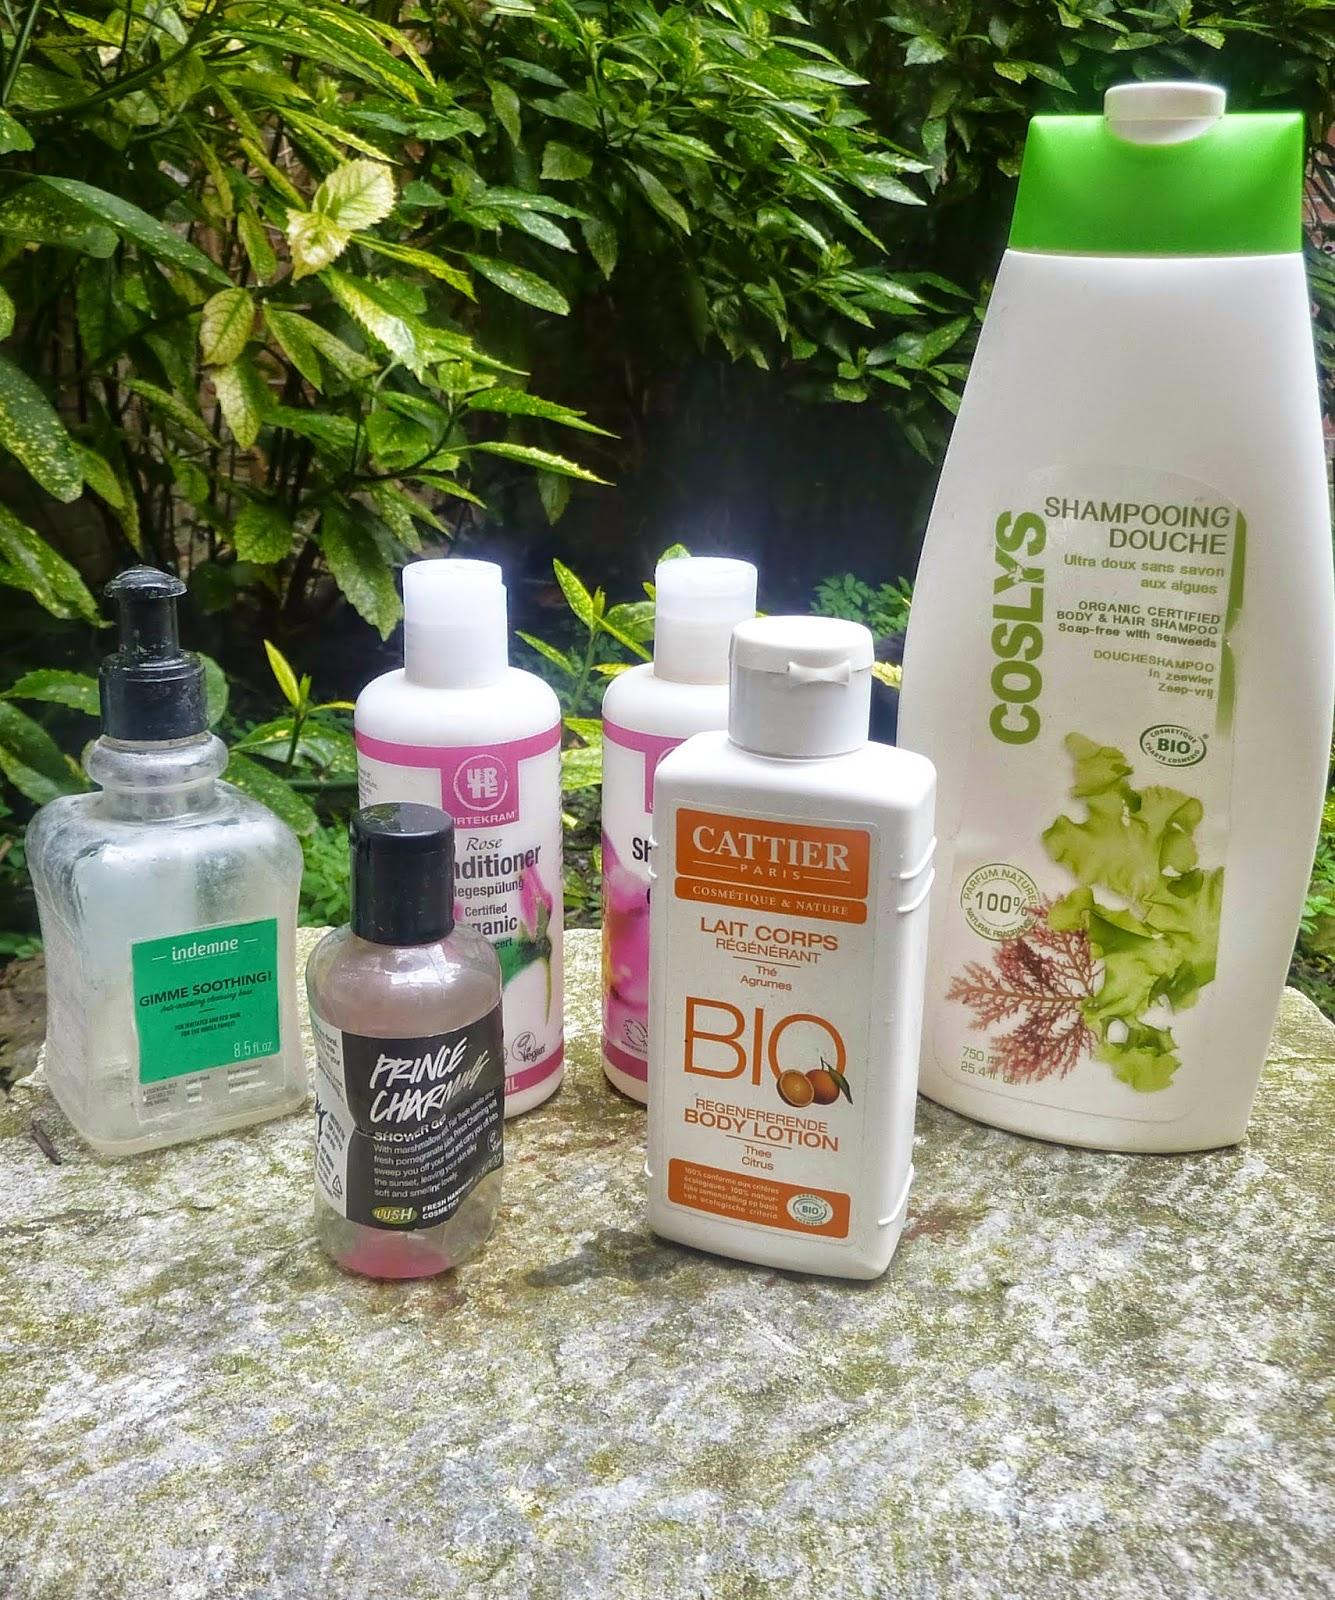 produits-termines-mars-2015-gel-douche-coslys-lush-shampoing-Urtekram-cattier-alessaknox.be